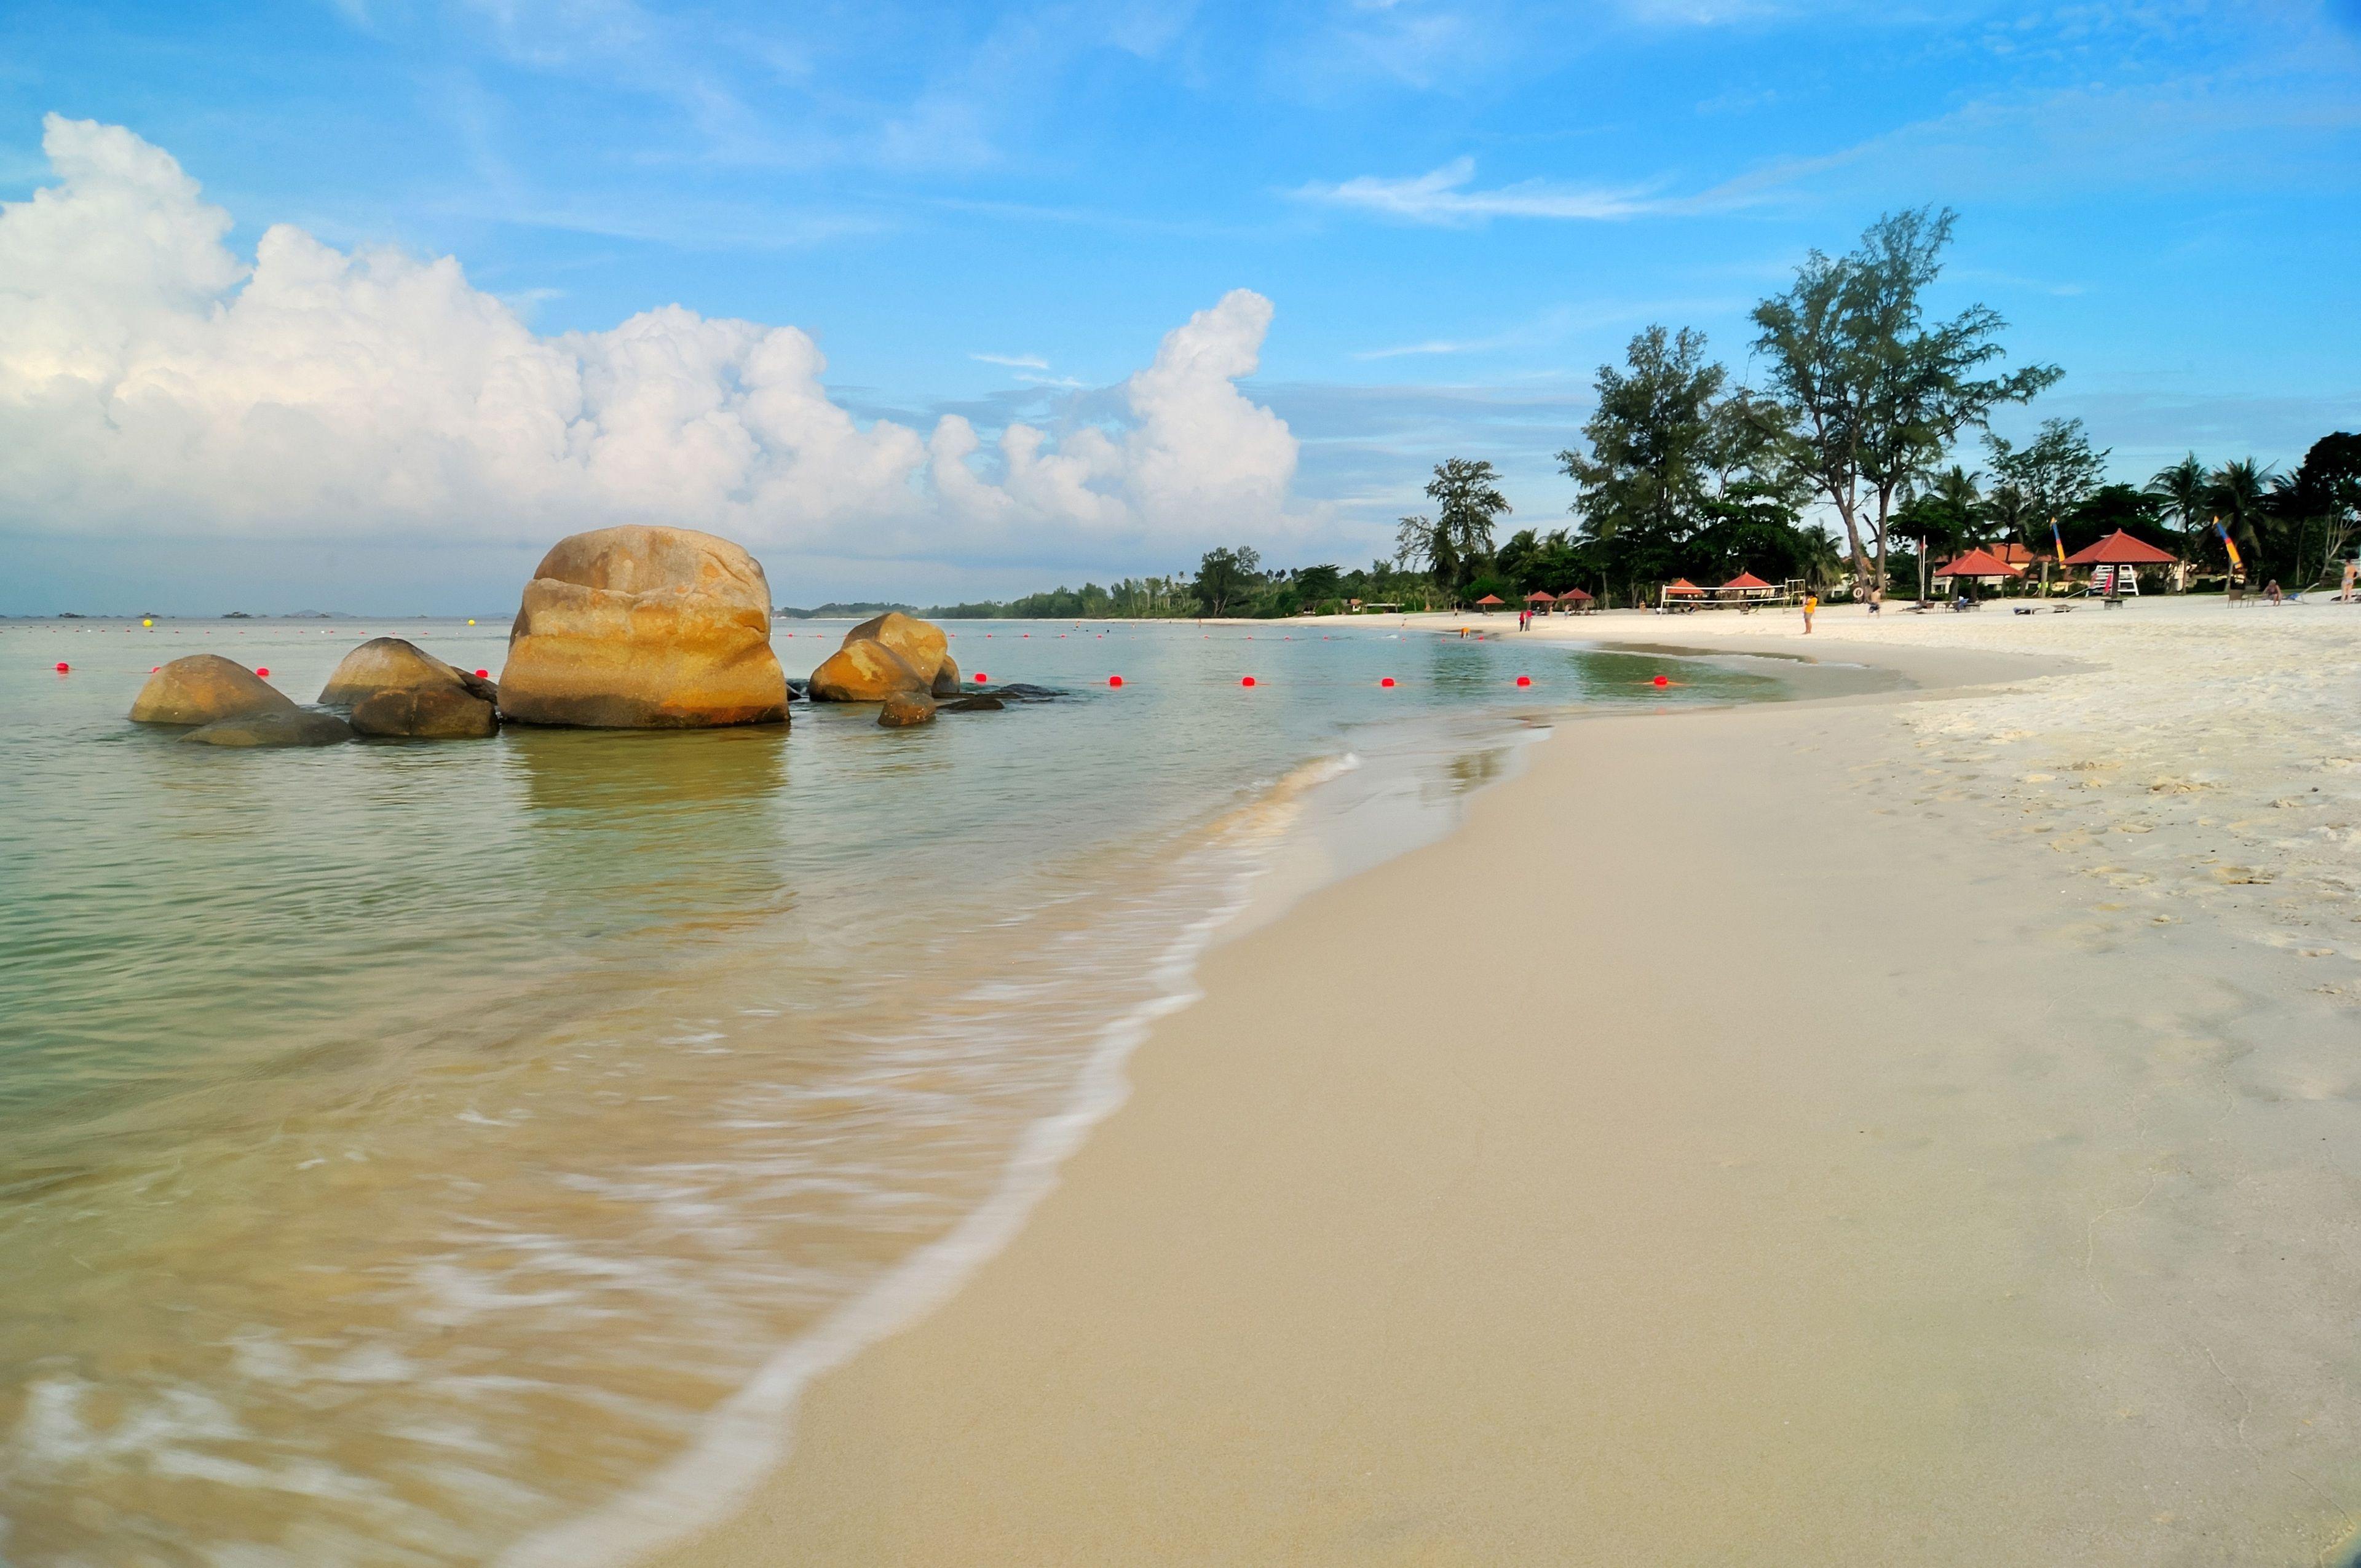 Bintan Lagoon Resort Bintan Island Inr 11051 Off 1 7 8 2 5